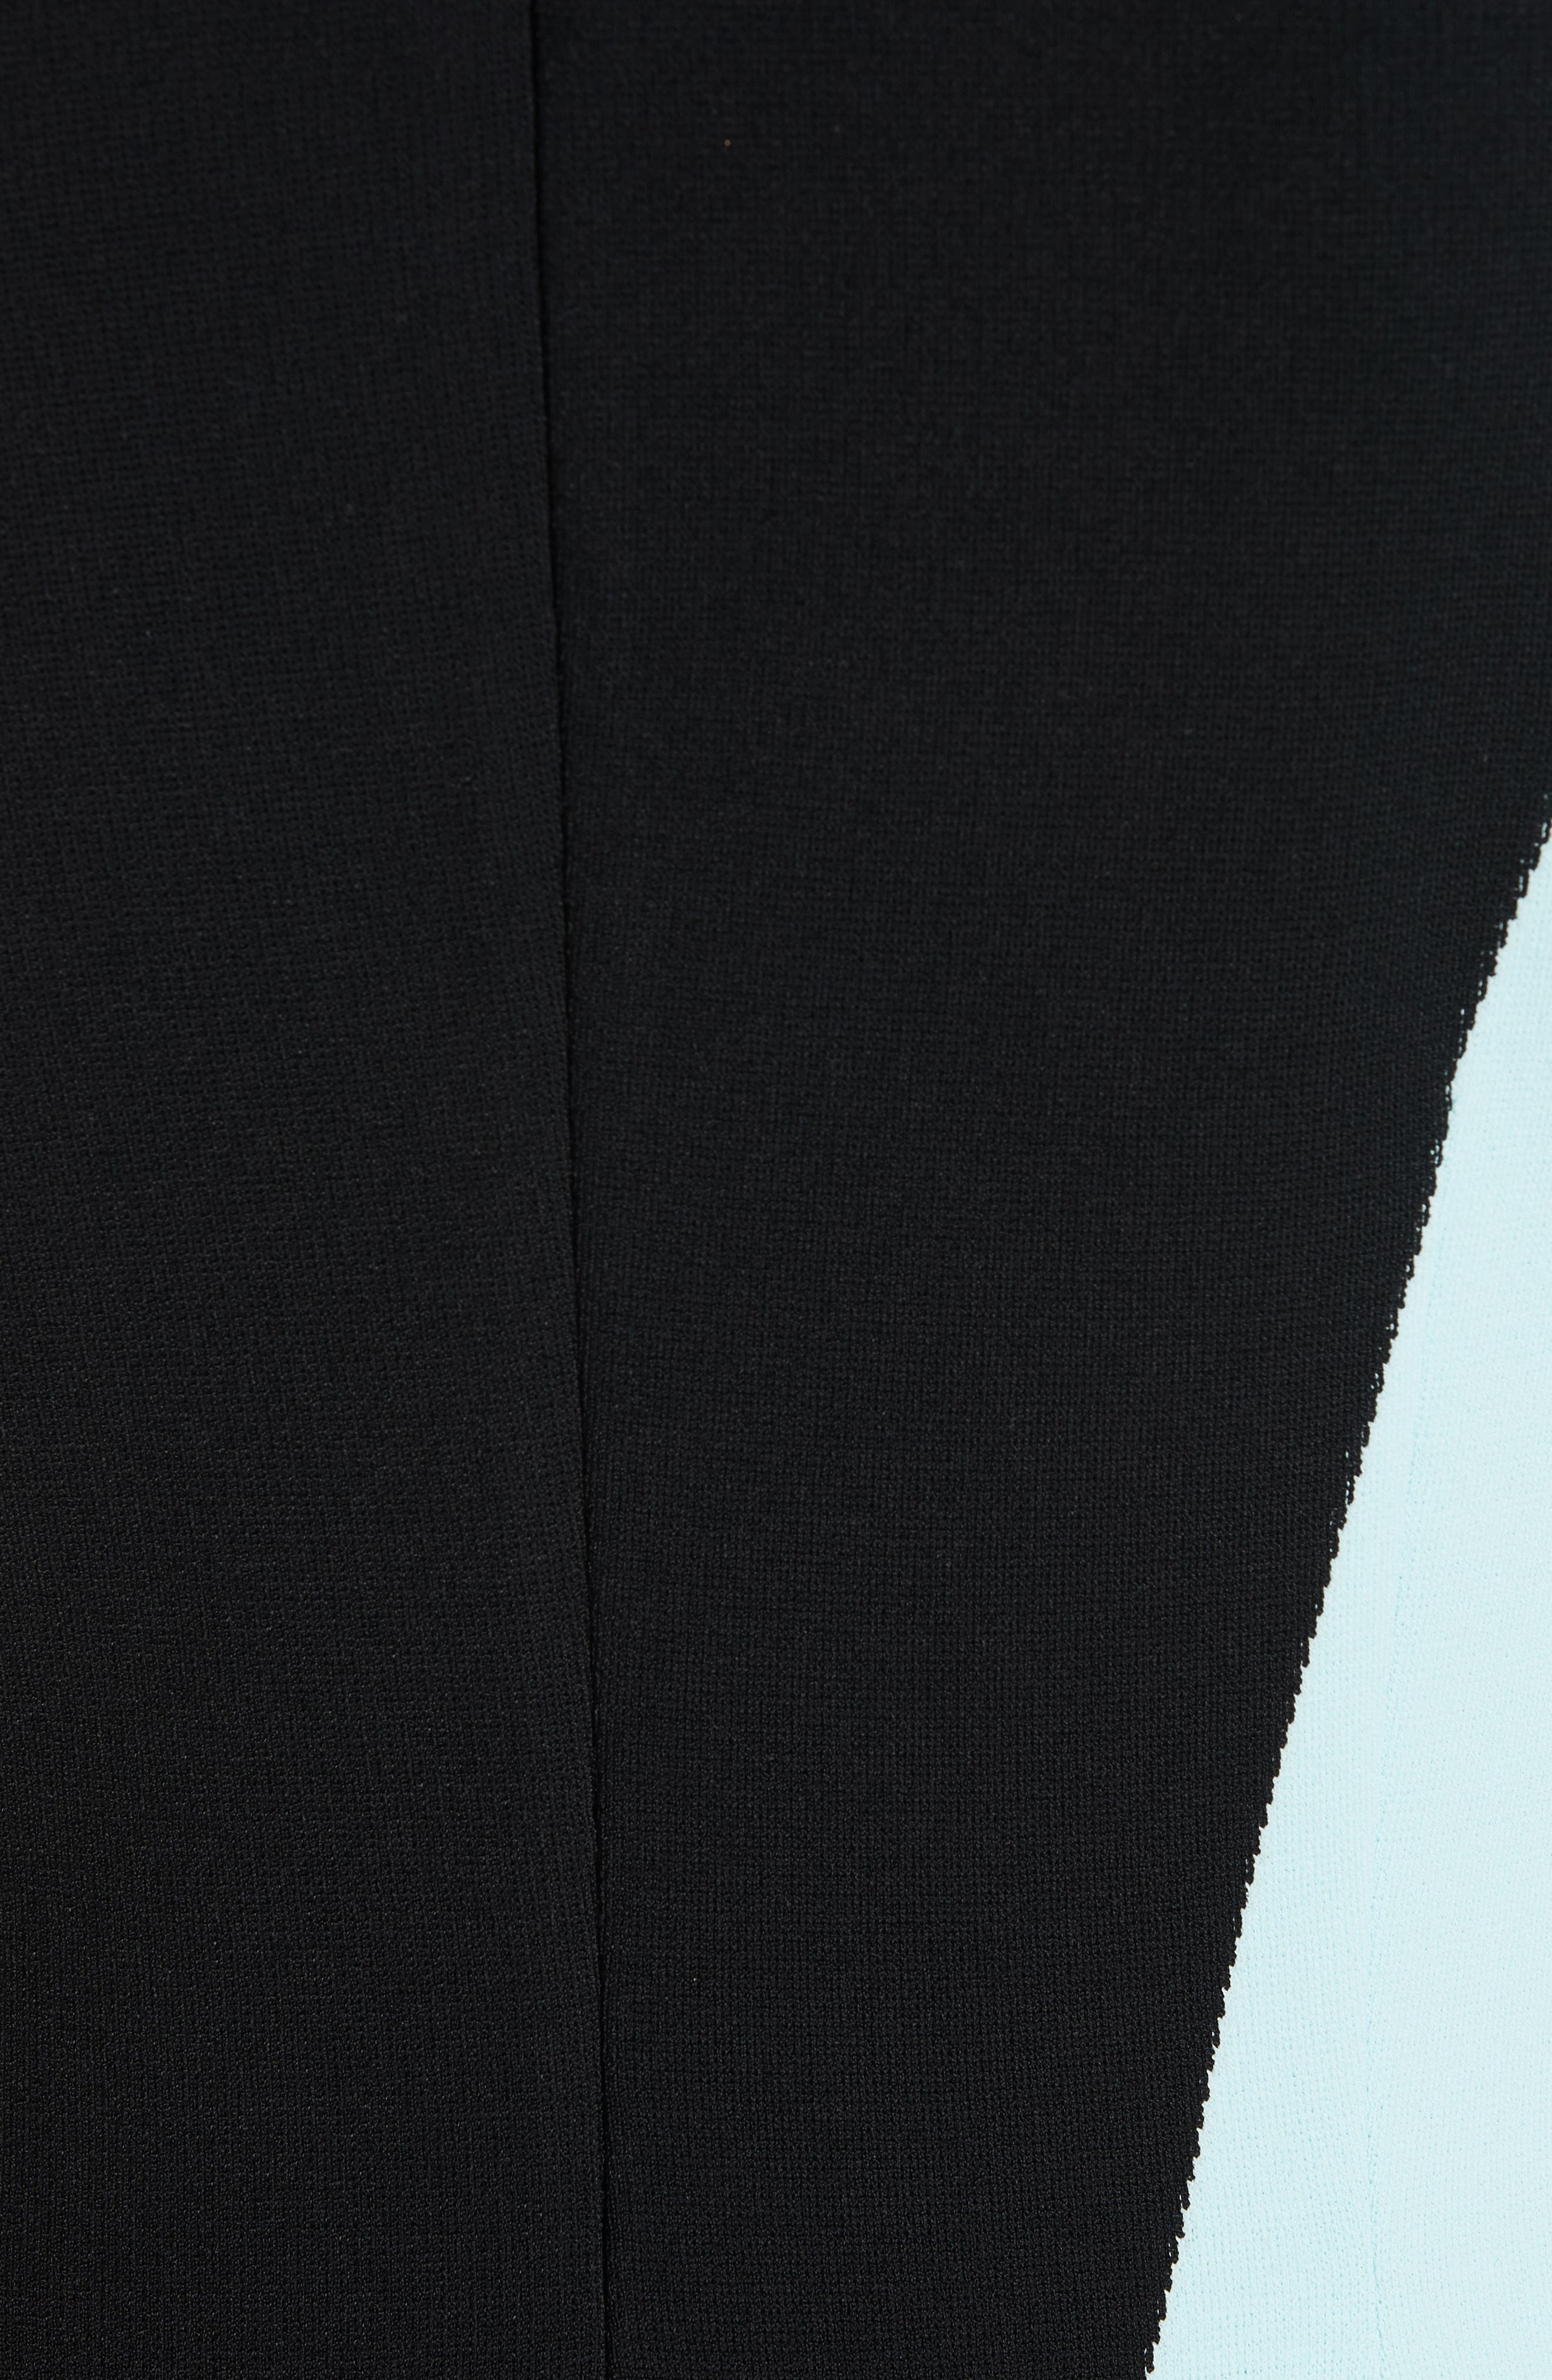 ST. JOHN COLLECTION, Luxe Sculpture Knit Dress, Alternate thumbnail 6, color, SEAFOAM/ CAVIAR